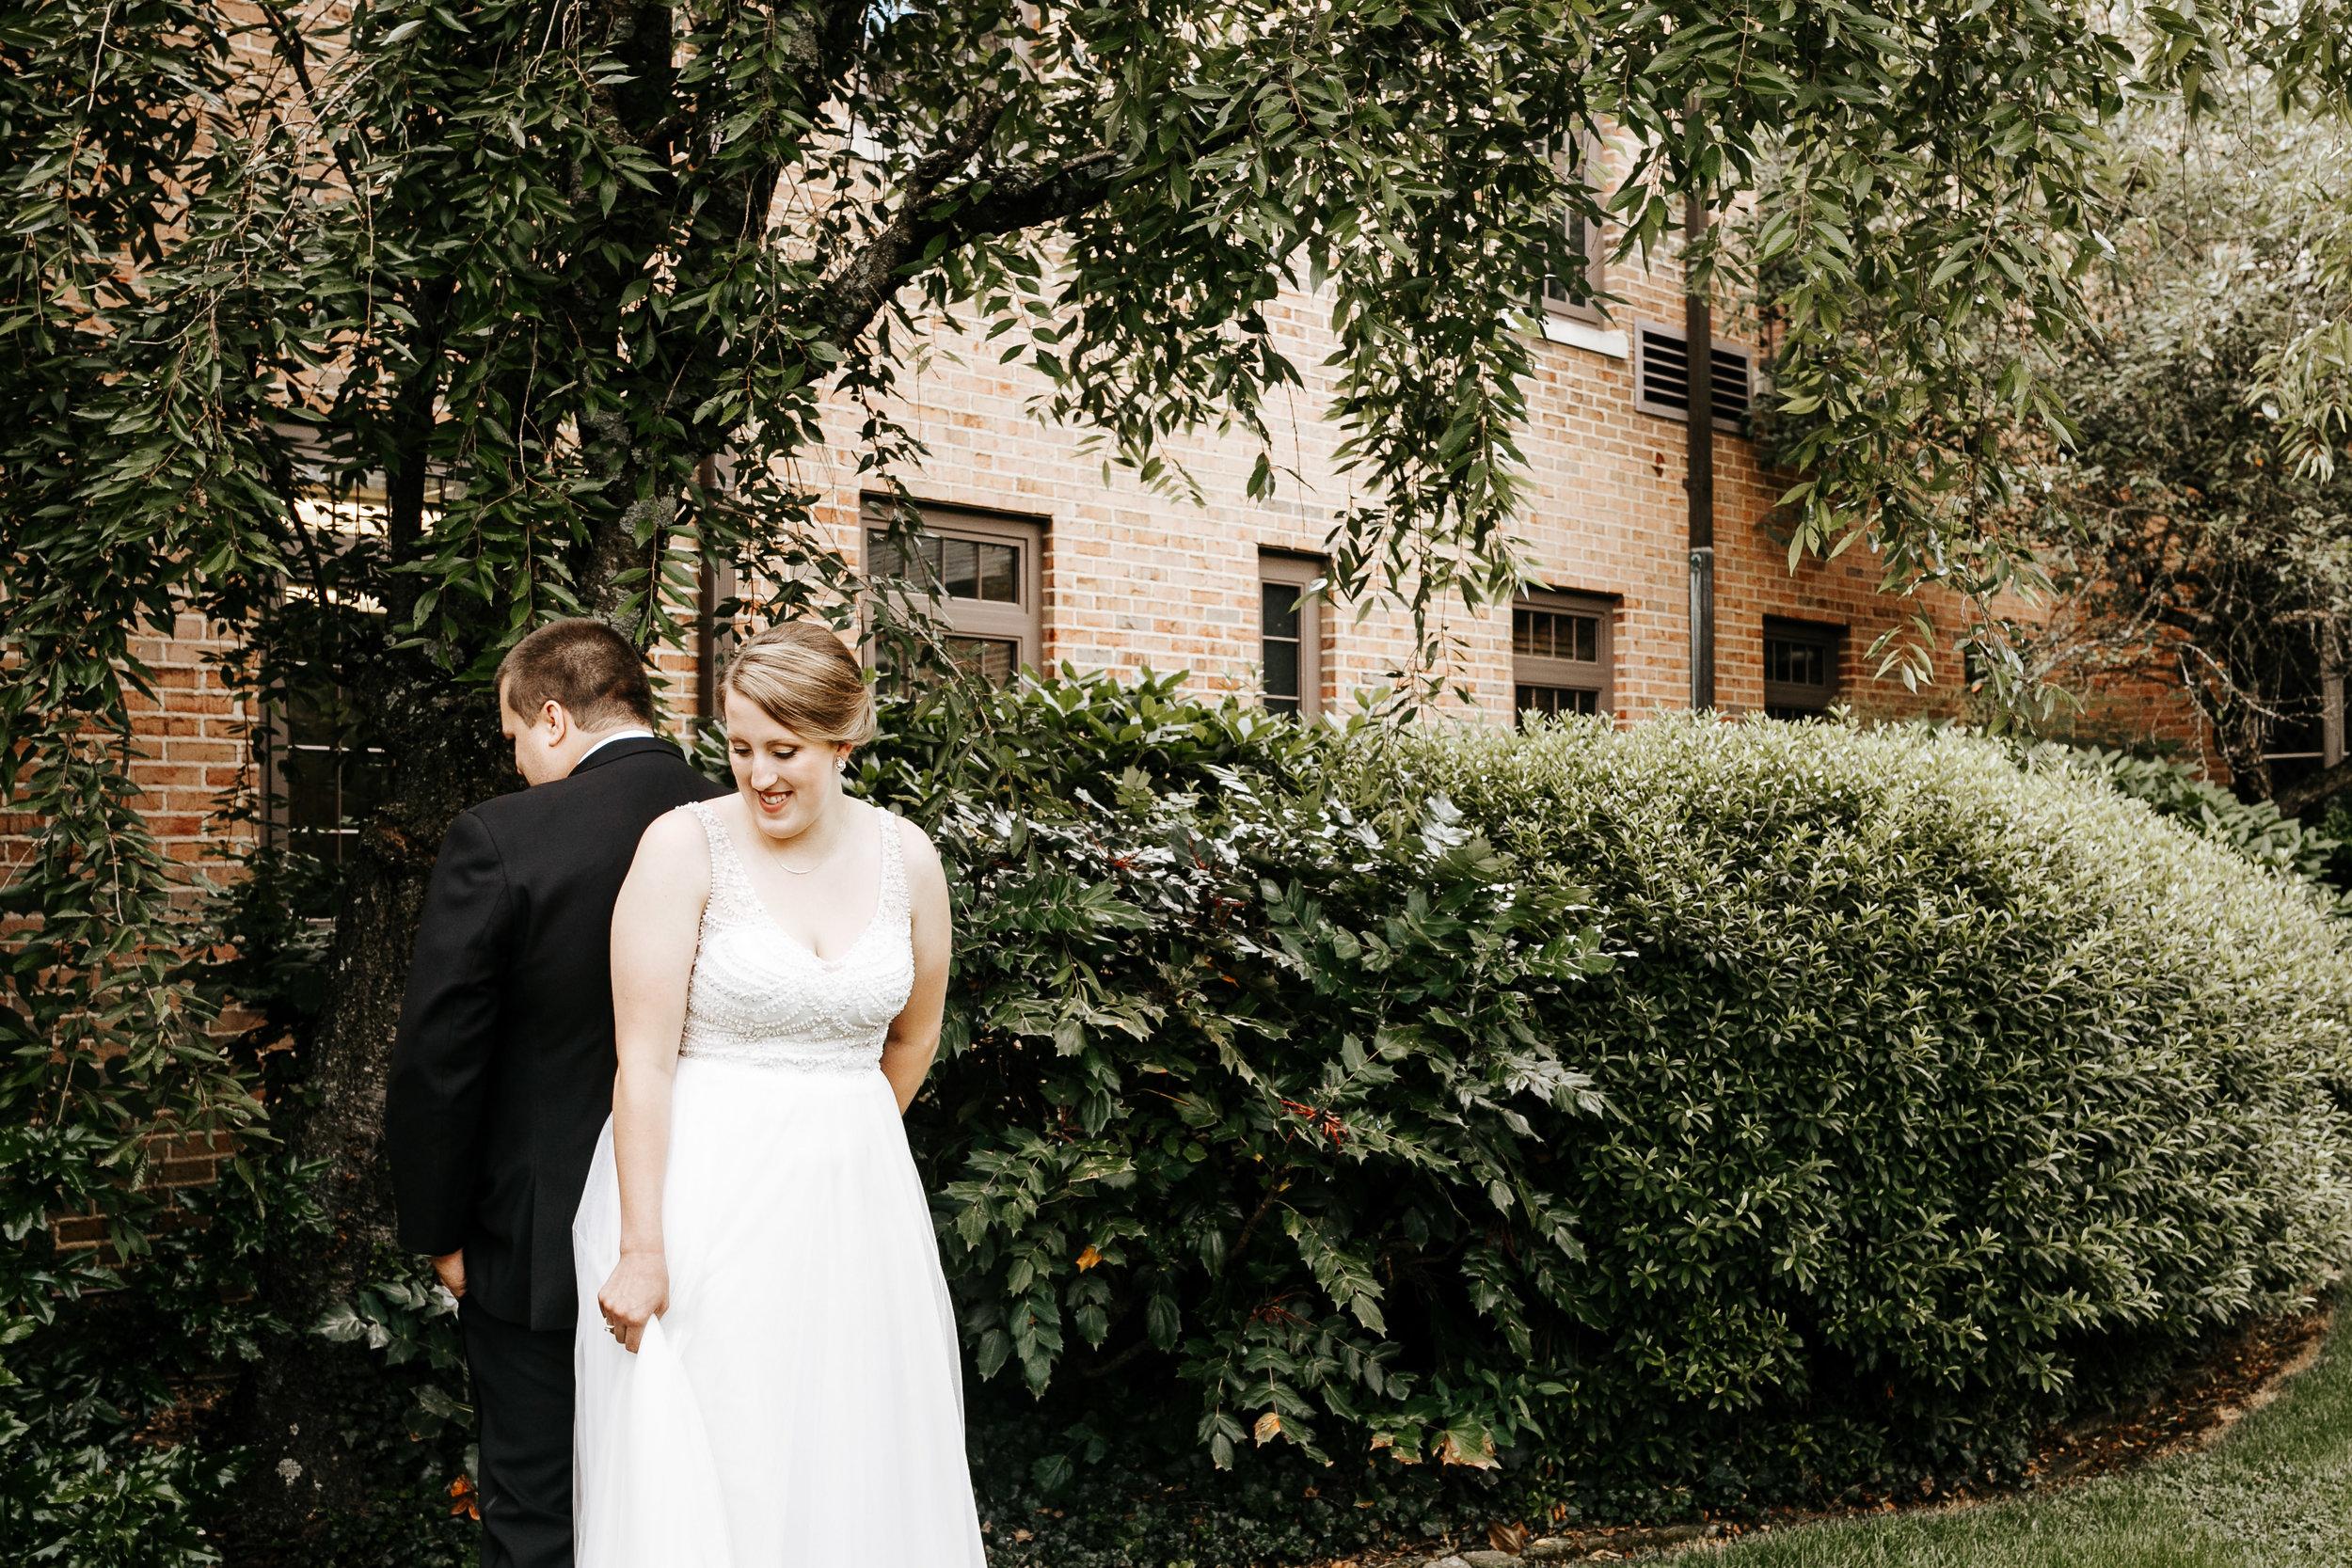 bohemian-photographer-wedding-tennessee-31.jpg